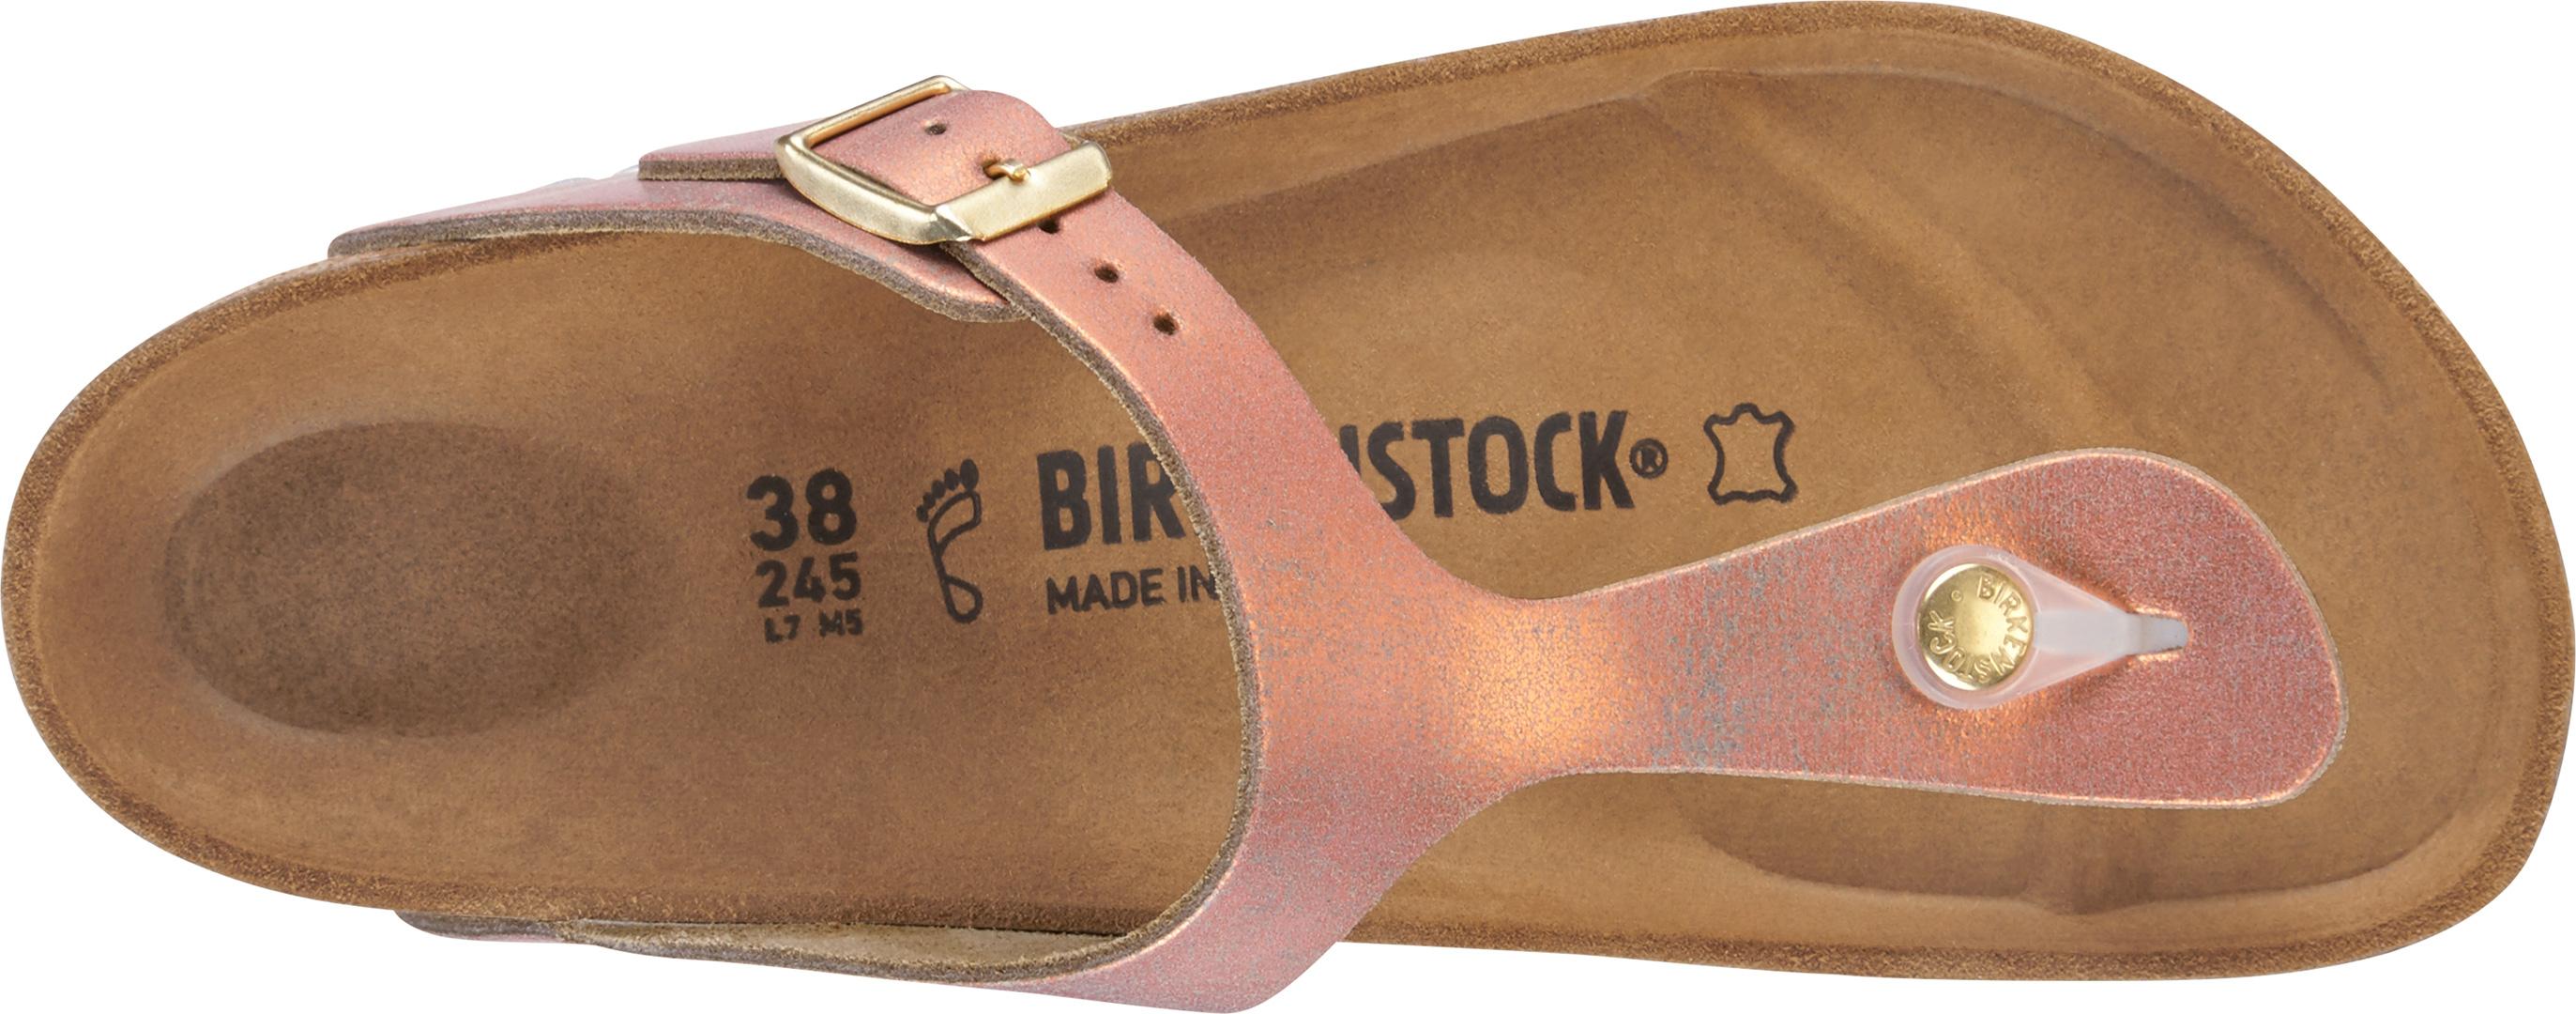 separation shoes e6910 9bfc5 GIZEH Sandal 2019 washed metallic sea copper